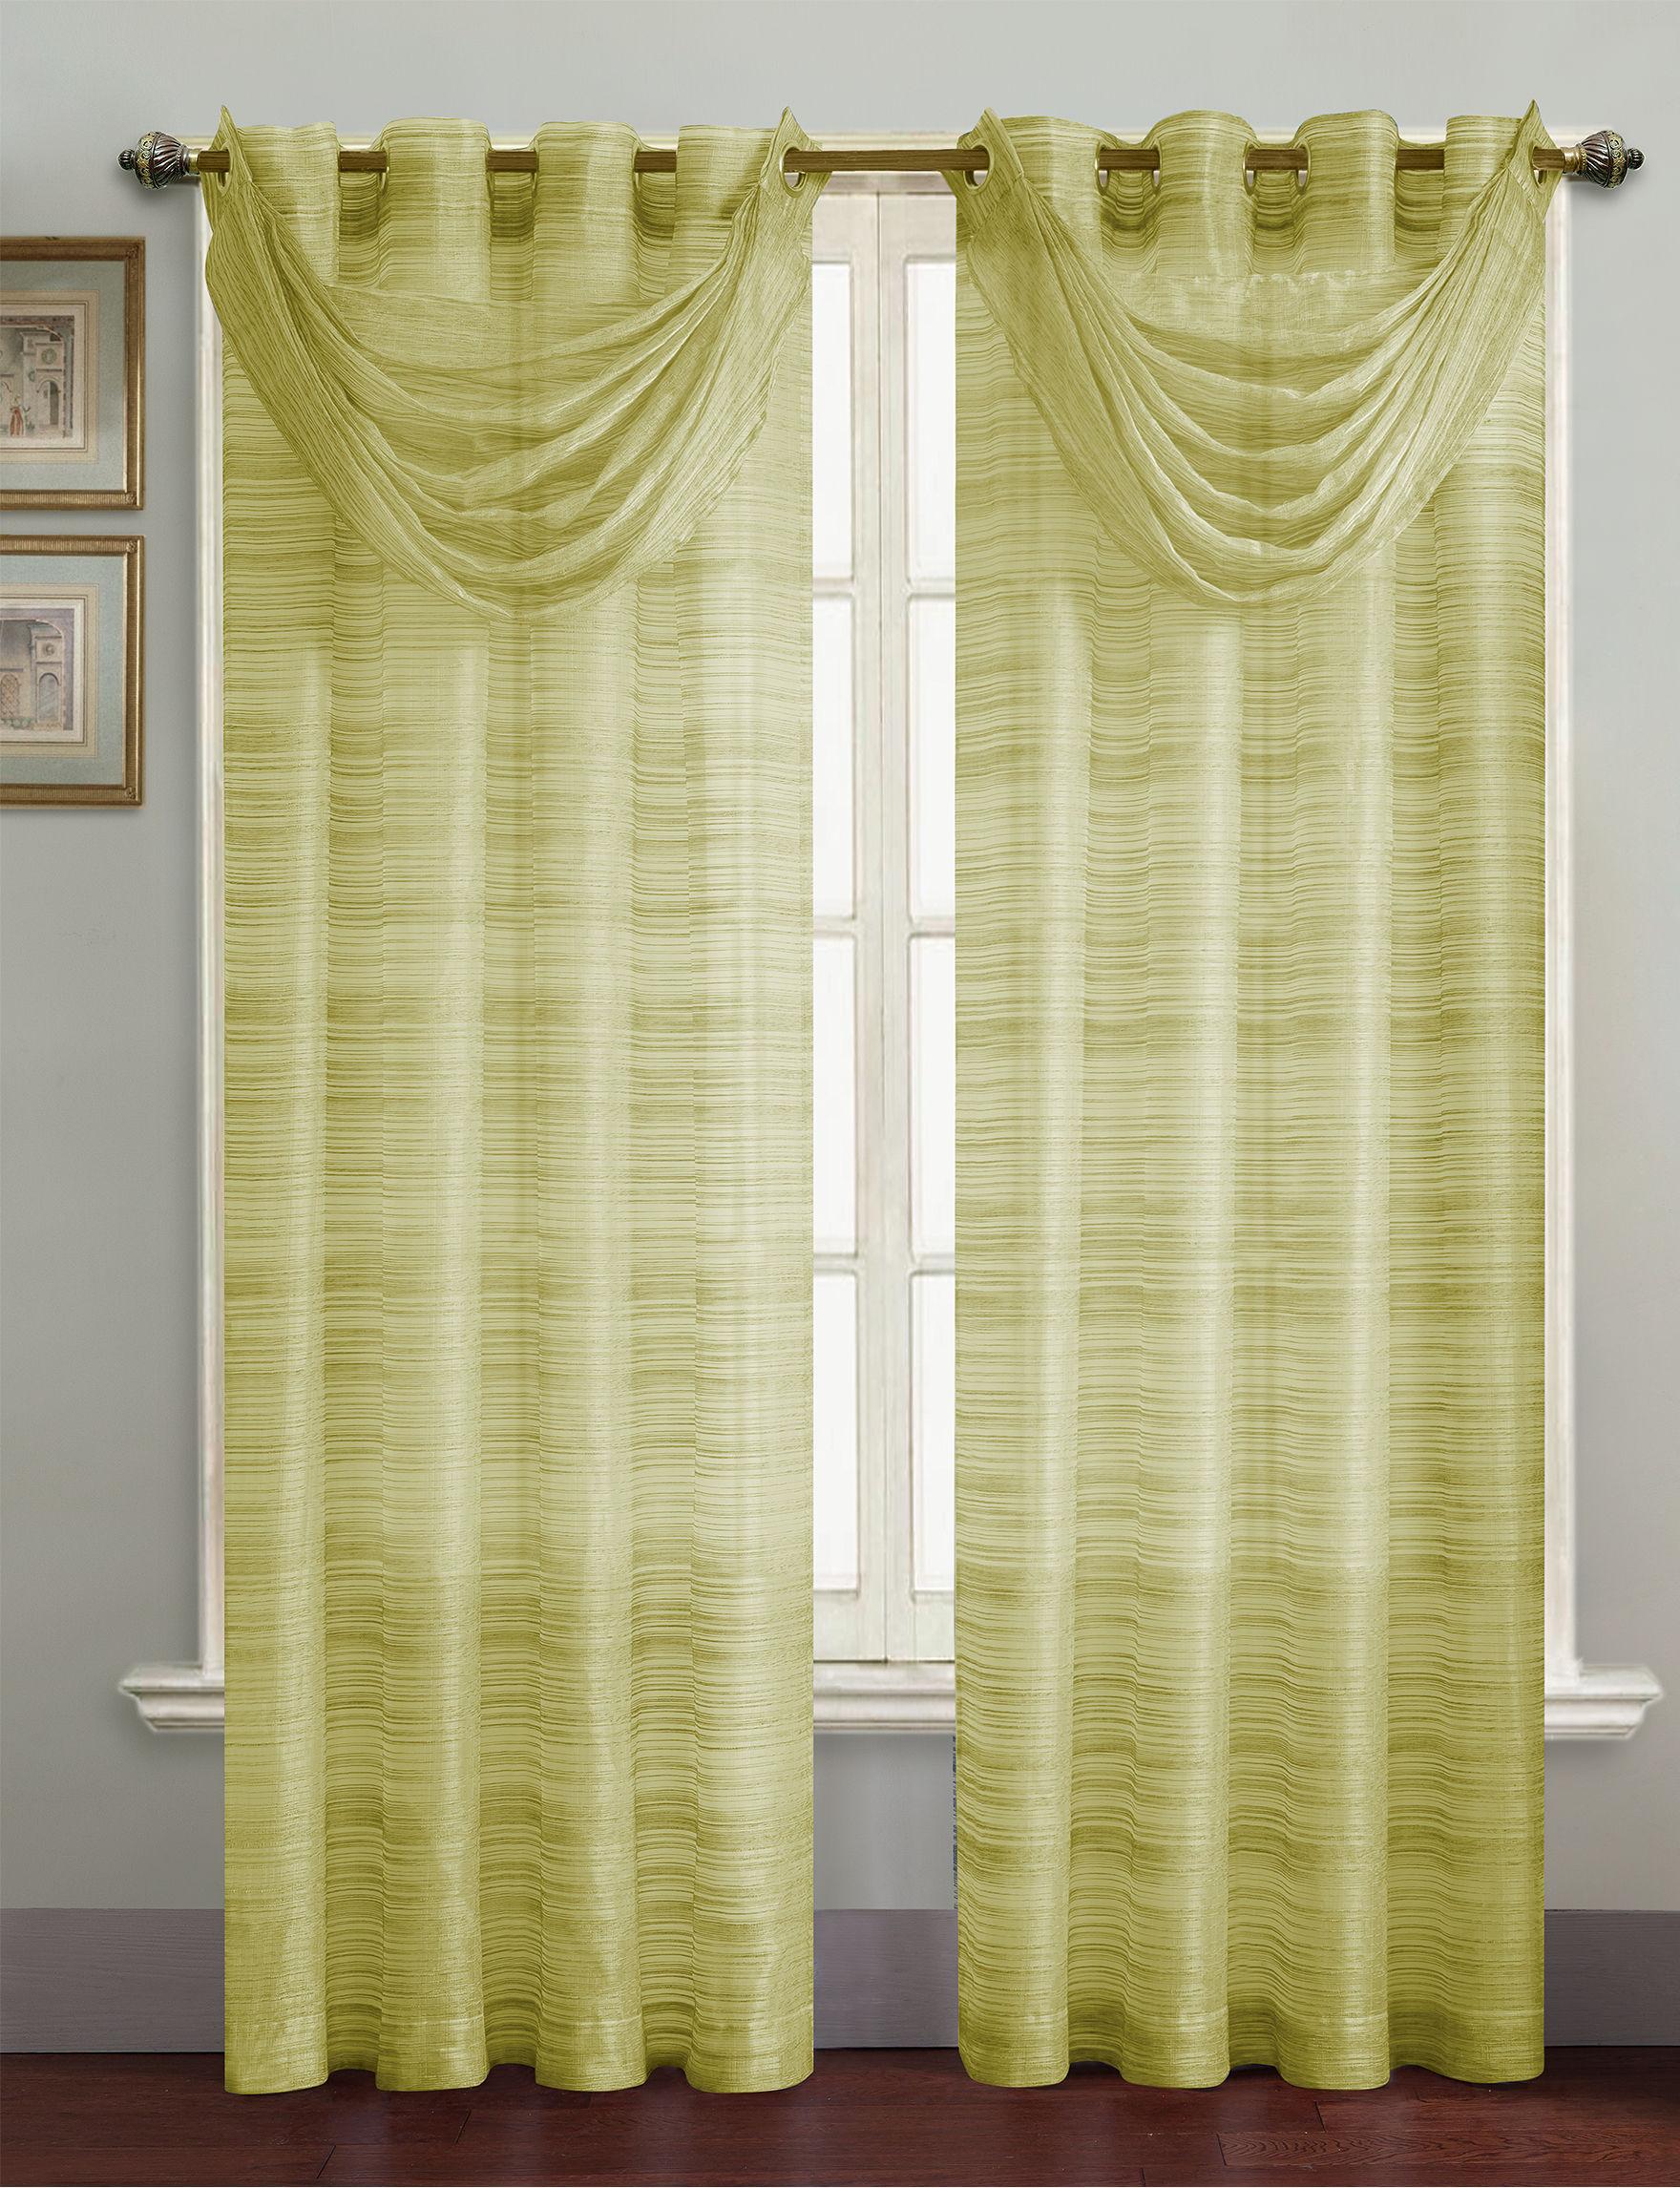 Victoria Classics Sage Curtains & Drapes Window Treatments